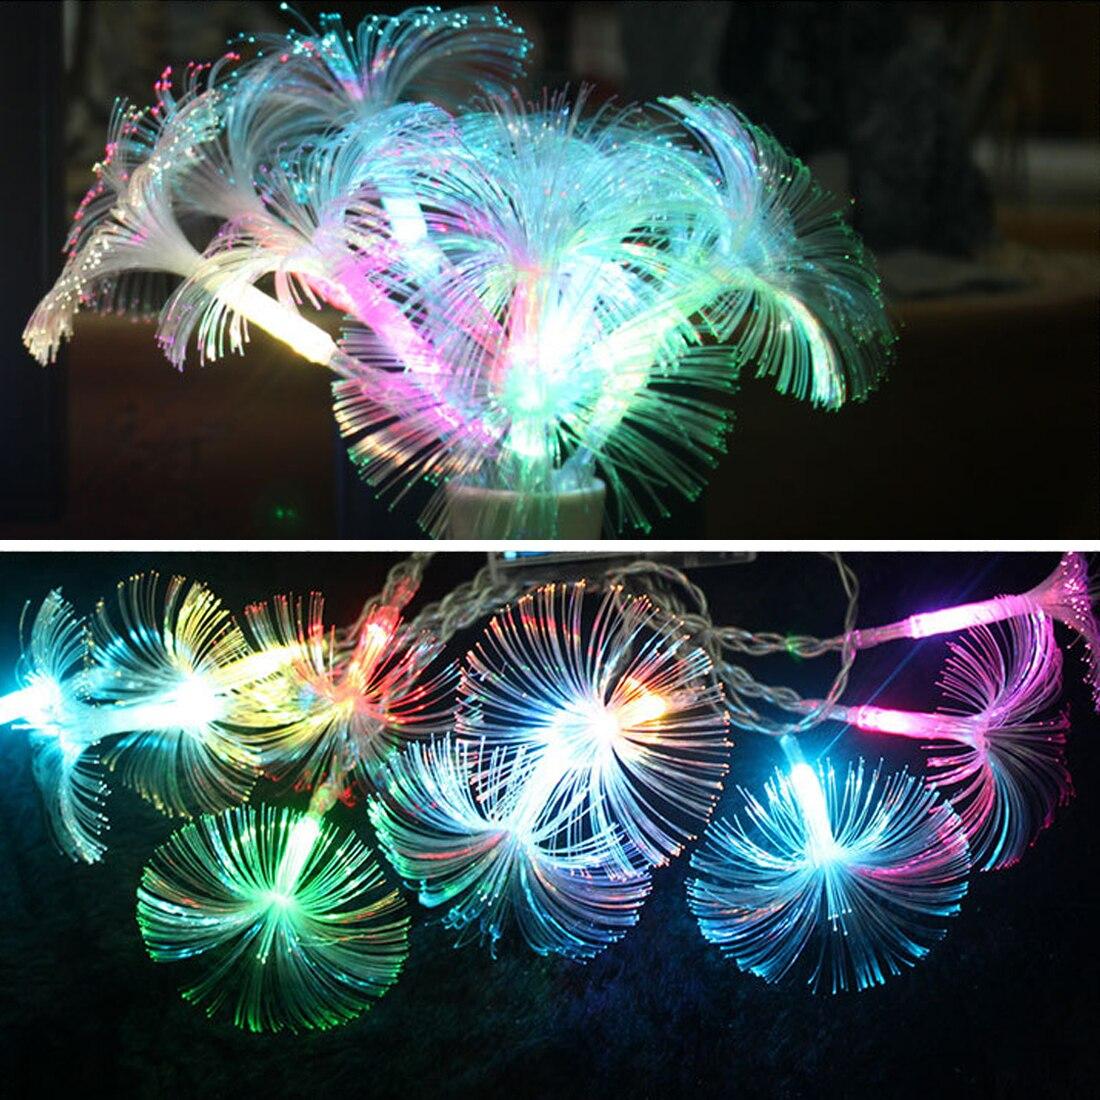 1pc Colorful Fiber Optic String Light 2.5M Holiday Christmas Decoration Lamp Trumpet Festival Lamp Holiday Light LED Night Light